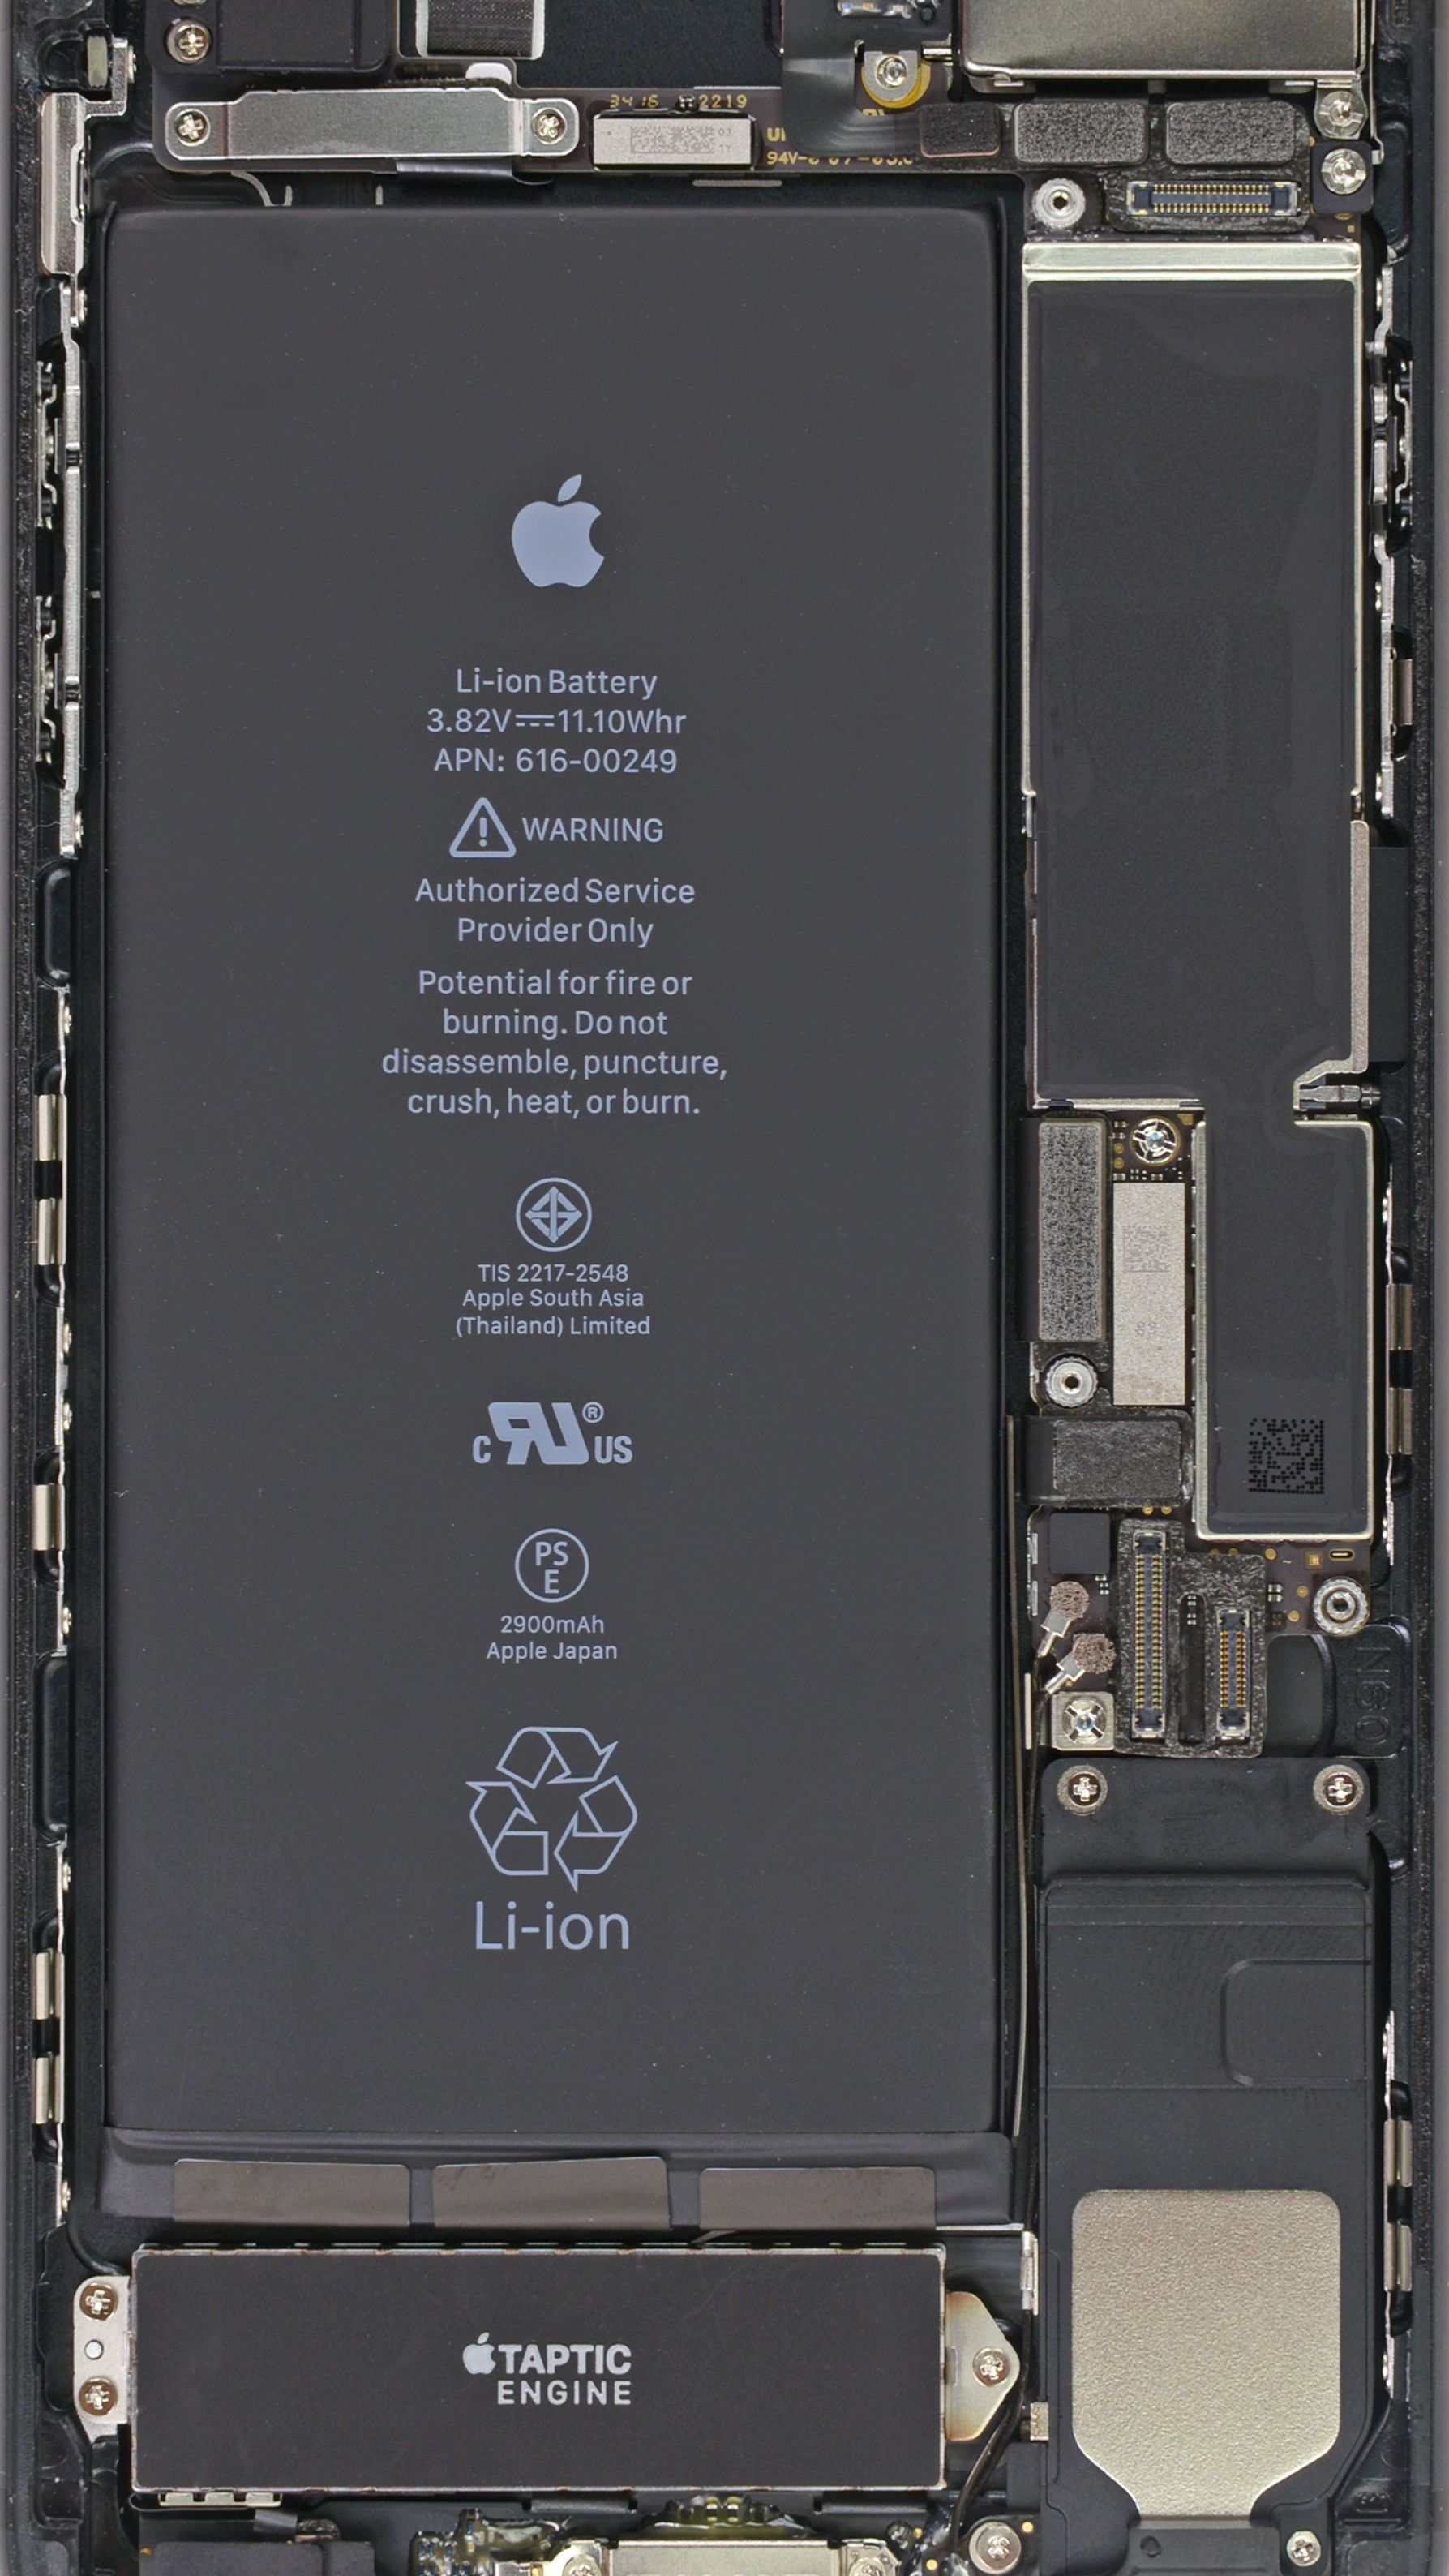 Oboxqc5xmlghqa6i 1 787 3 176 Pixels Kertas Dinding Lucu Wallpaper Iphone Wallpaper Ponsel